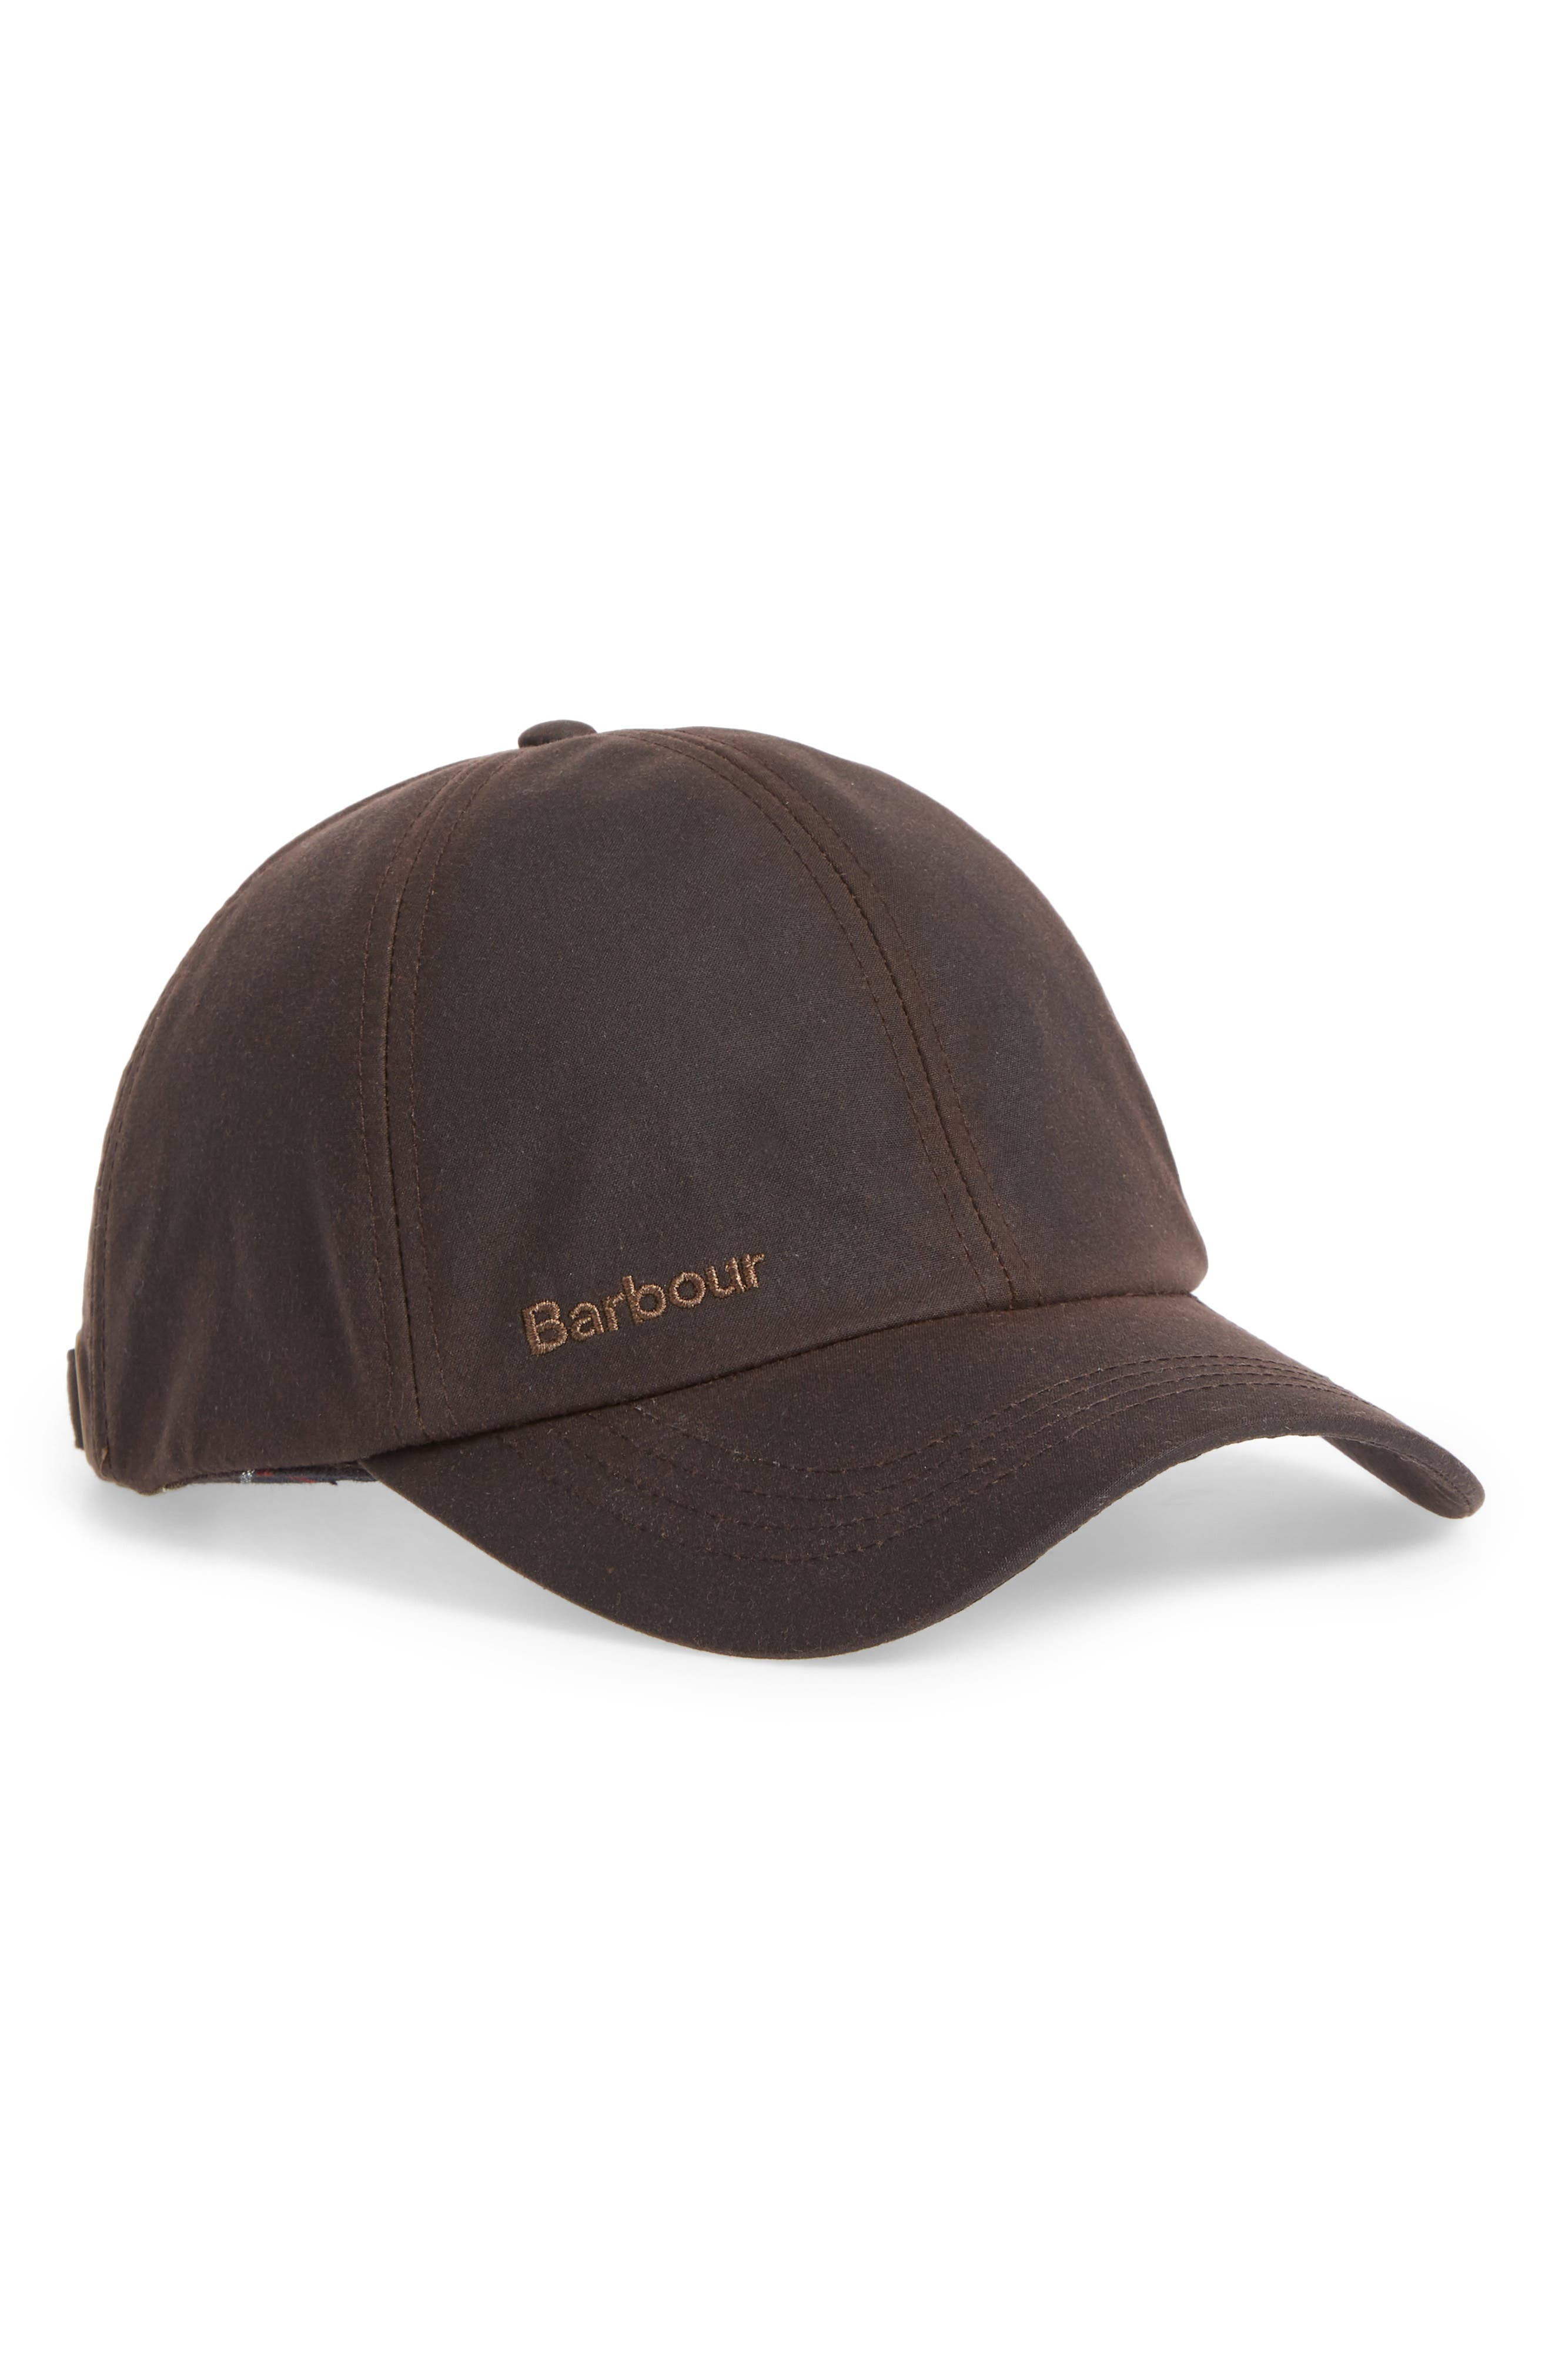 Prestbury Baseball Cap,                             Main thumbnail 1, color,                             Brown